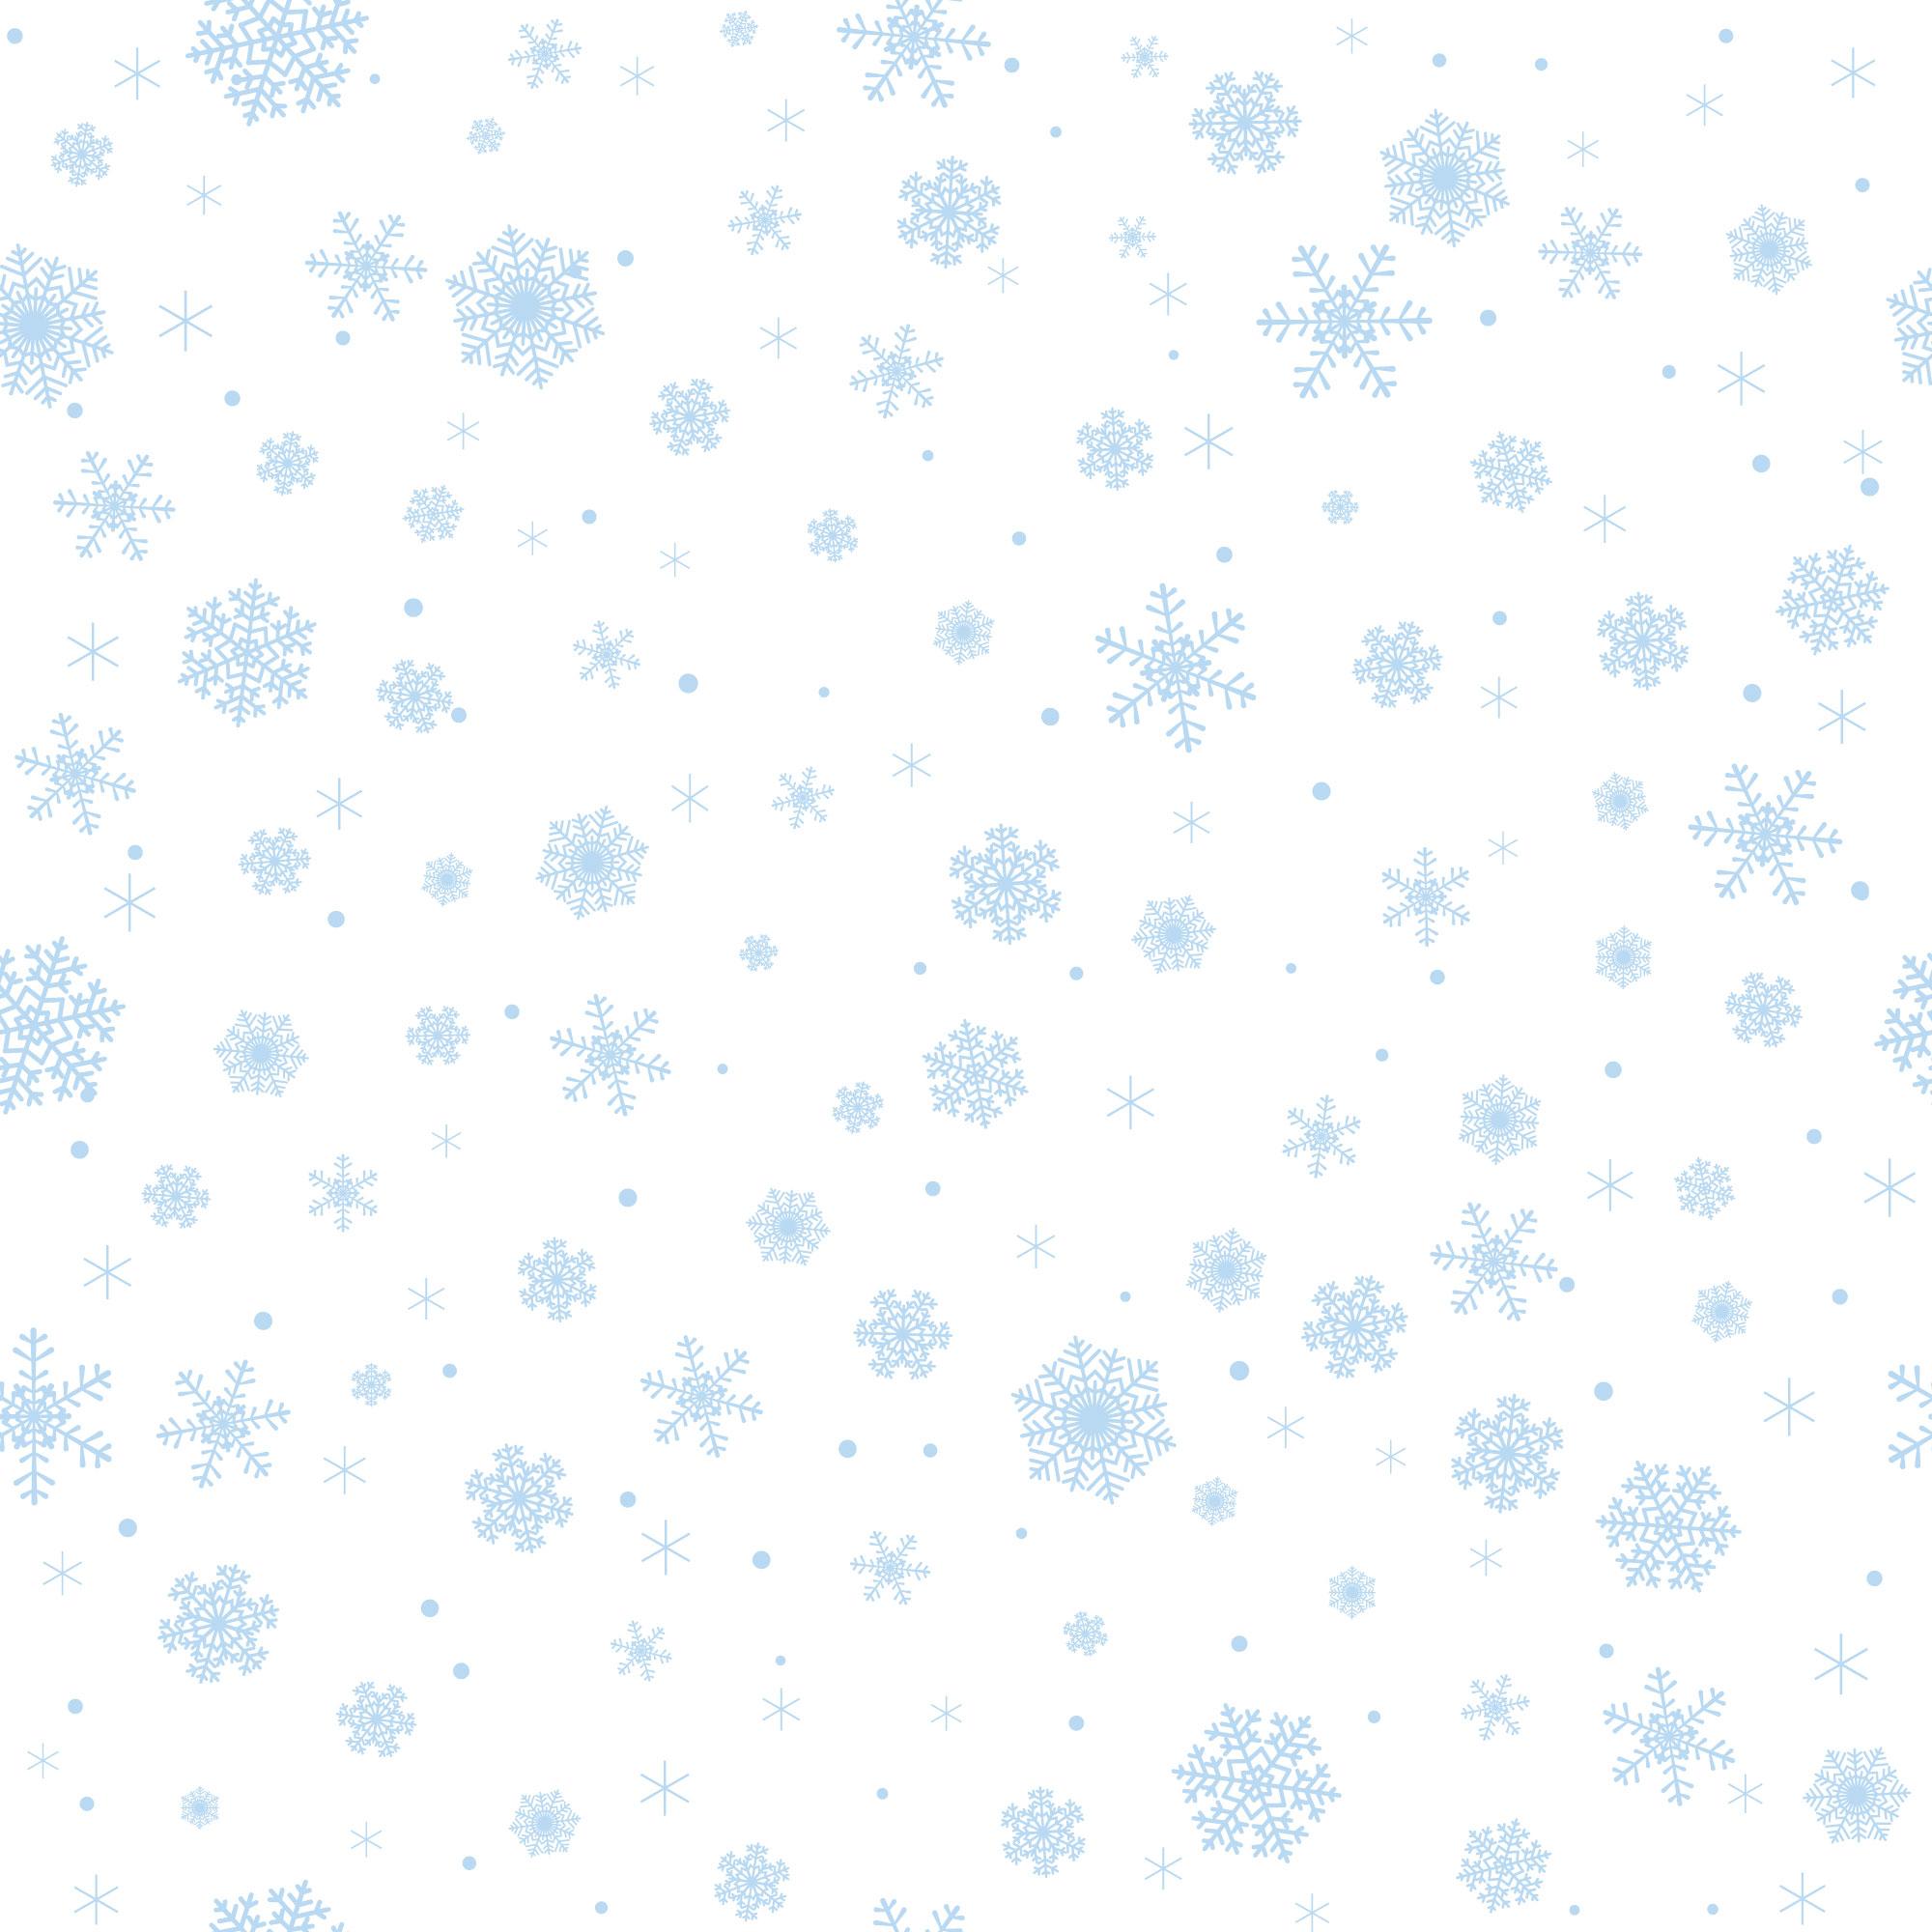 pin 雪 結晶 冬 背景 素材 の画像を on pinterest